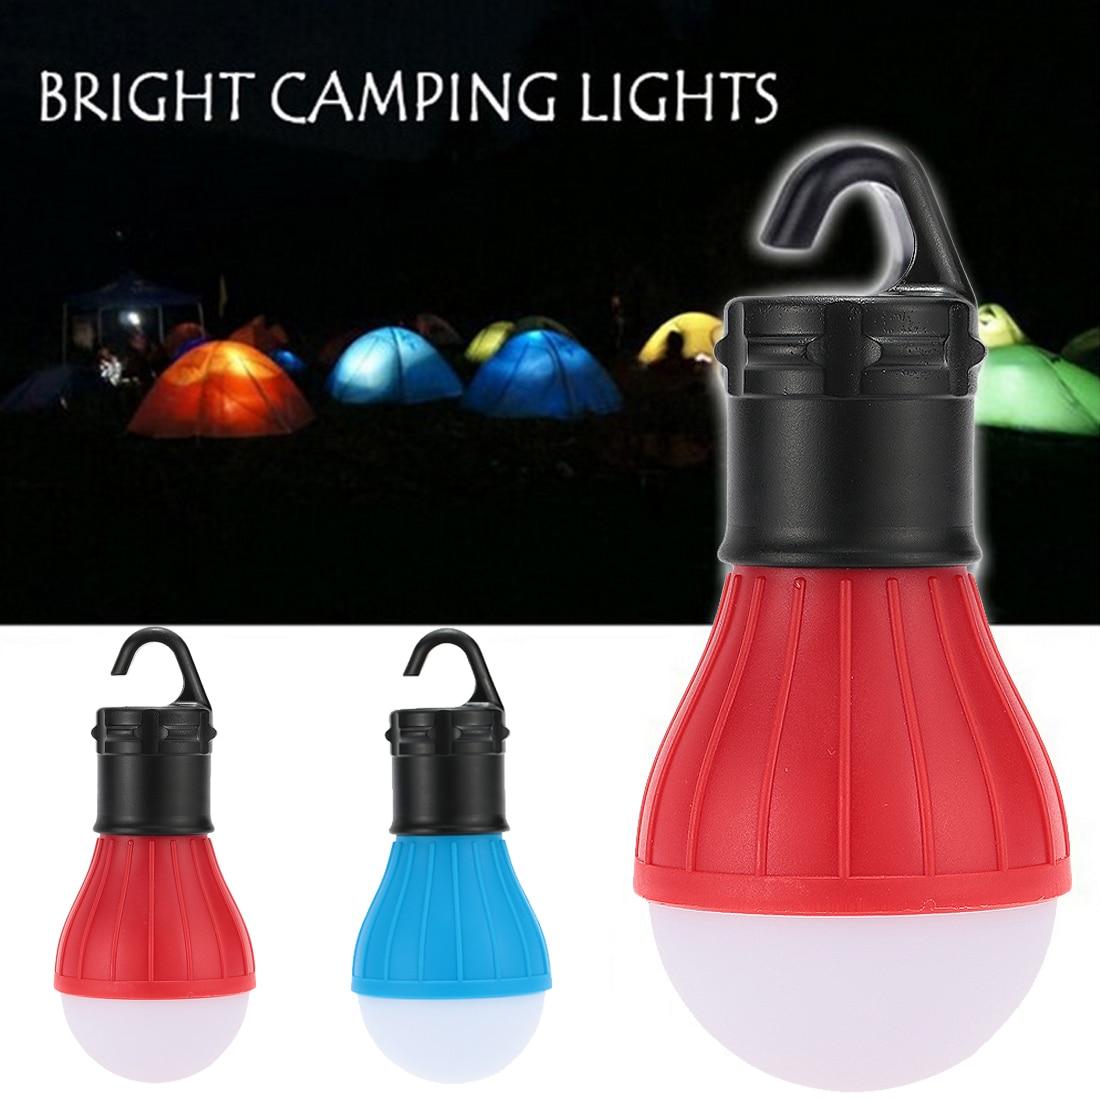 Portable Emergency Camping Tent Soft Light Outdoor Hanging SOS Lanters Bulb Fishing Lantern Hiking Energy Saving Lamp